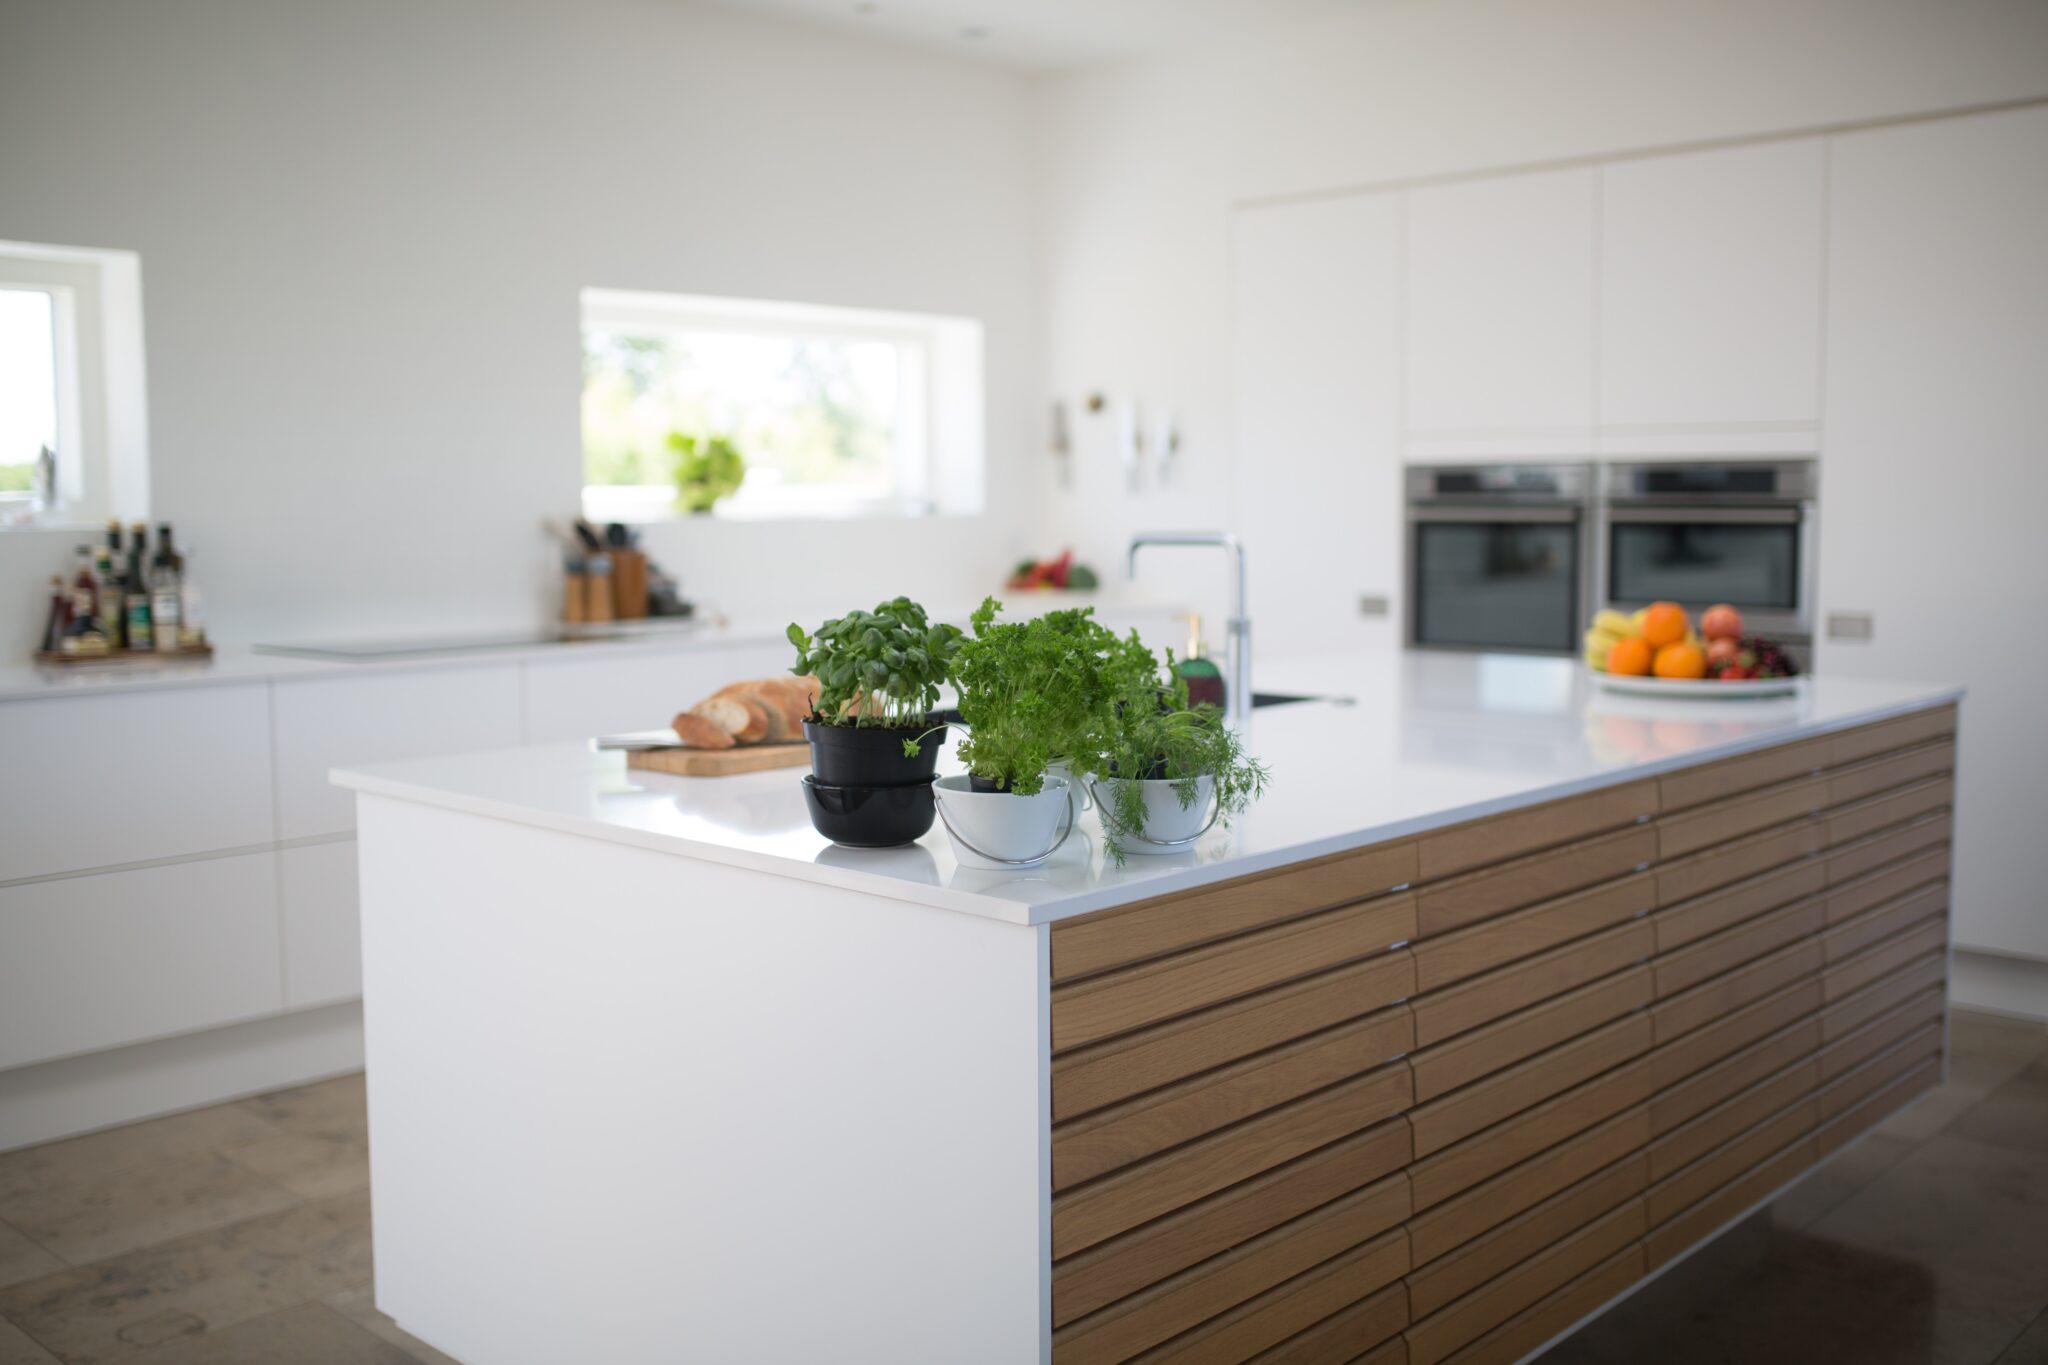 3 Ways to Keep Your Kitchen Eco-friendly